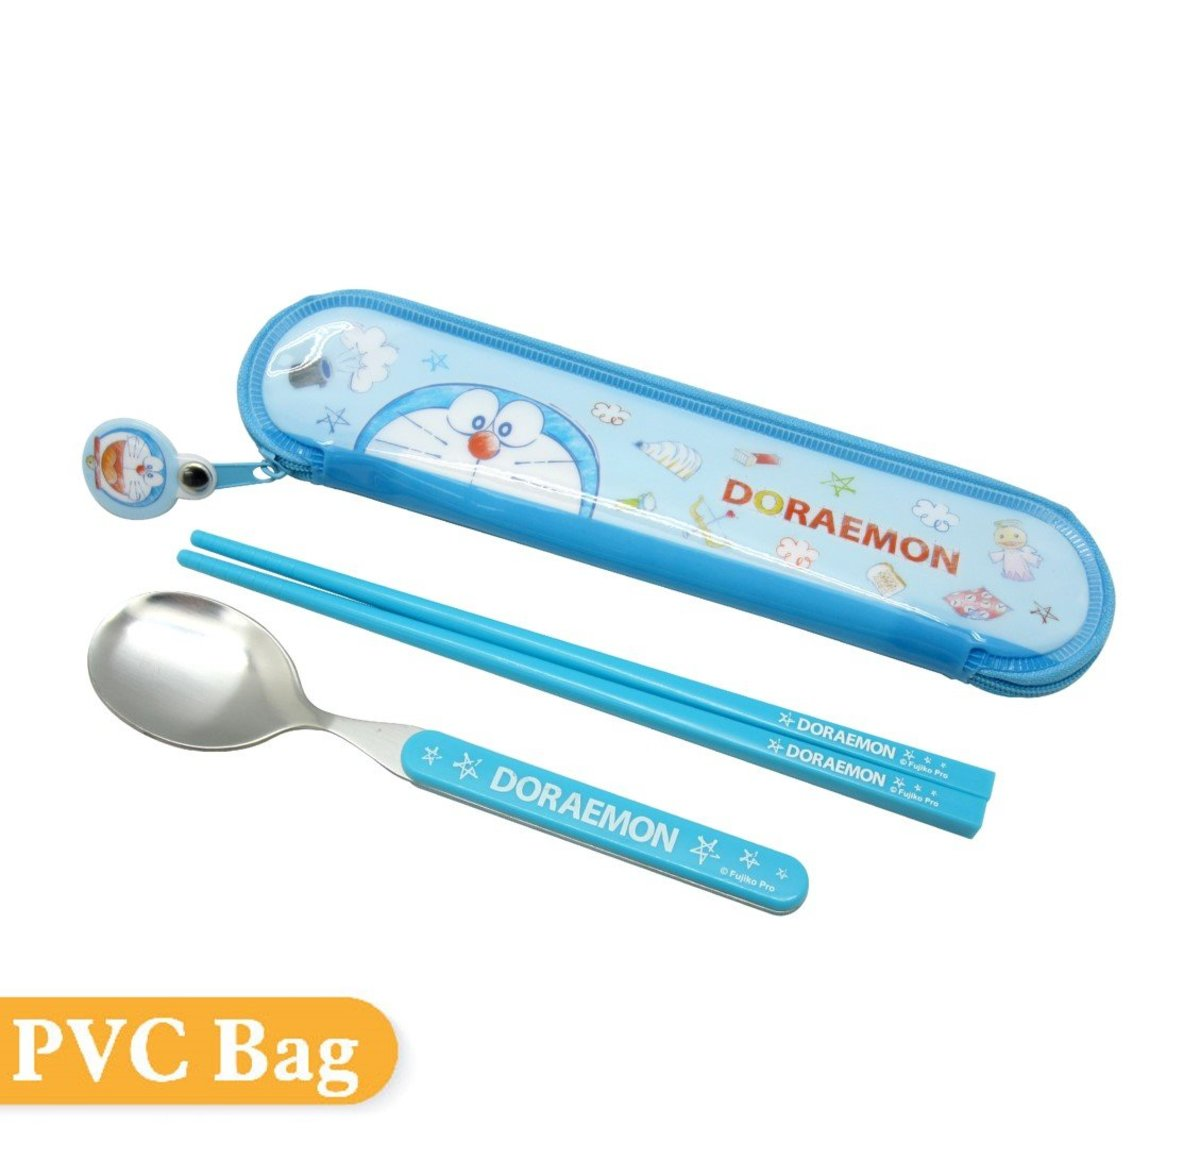 Culery Set with PVC bag D